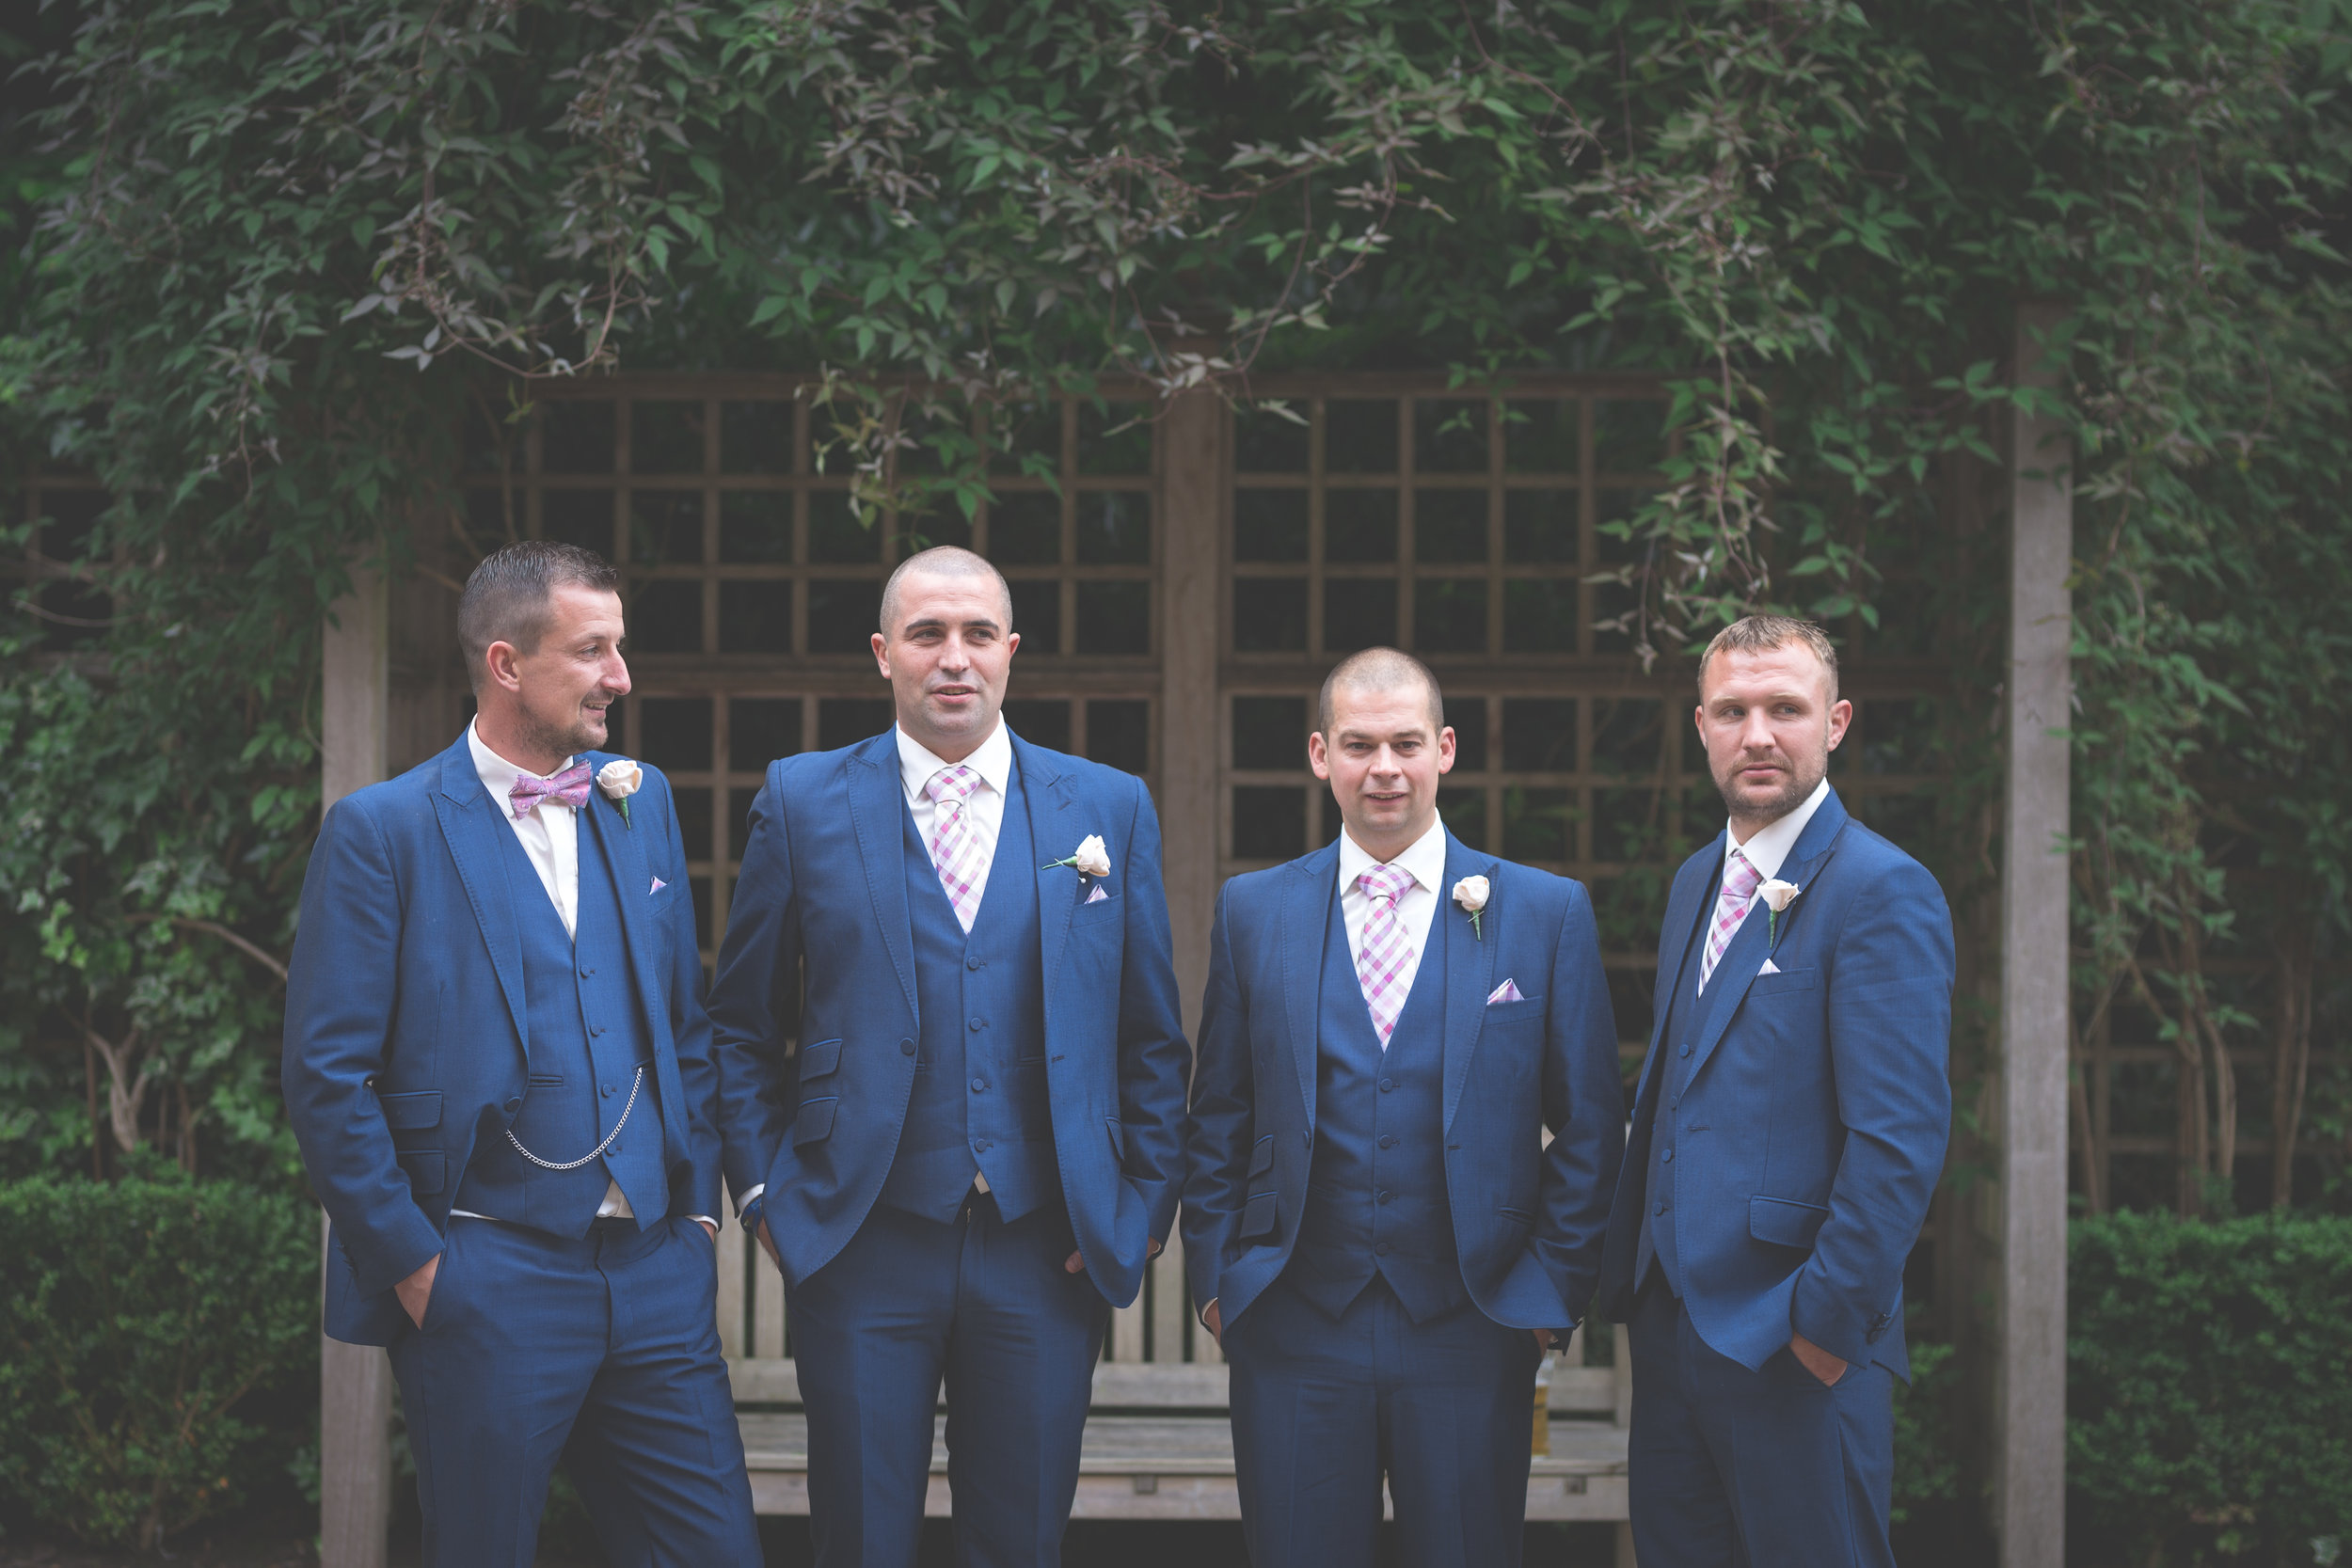 Antoinette & Stephen - Portraits | Brian McEwan Photography | Wedding Photographer Northern Ireland 77.jpg